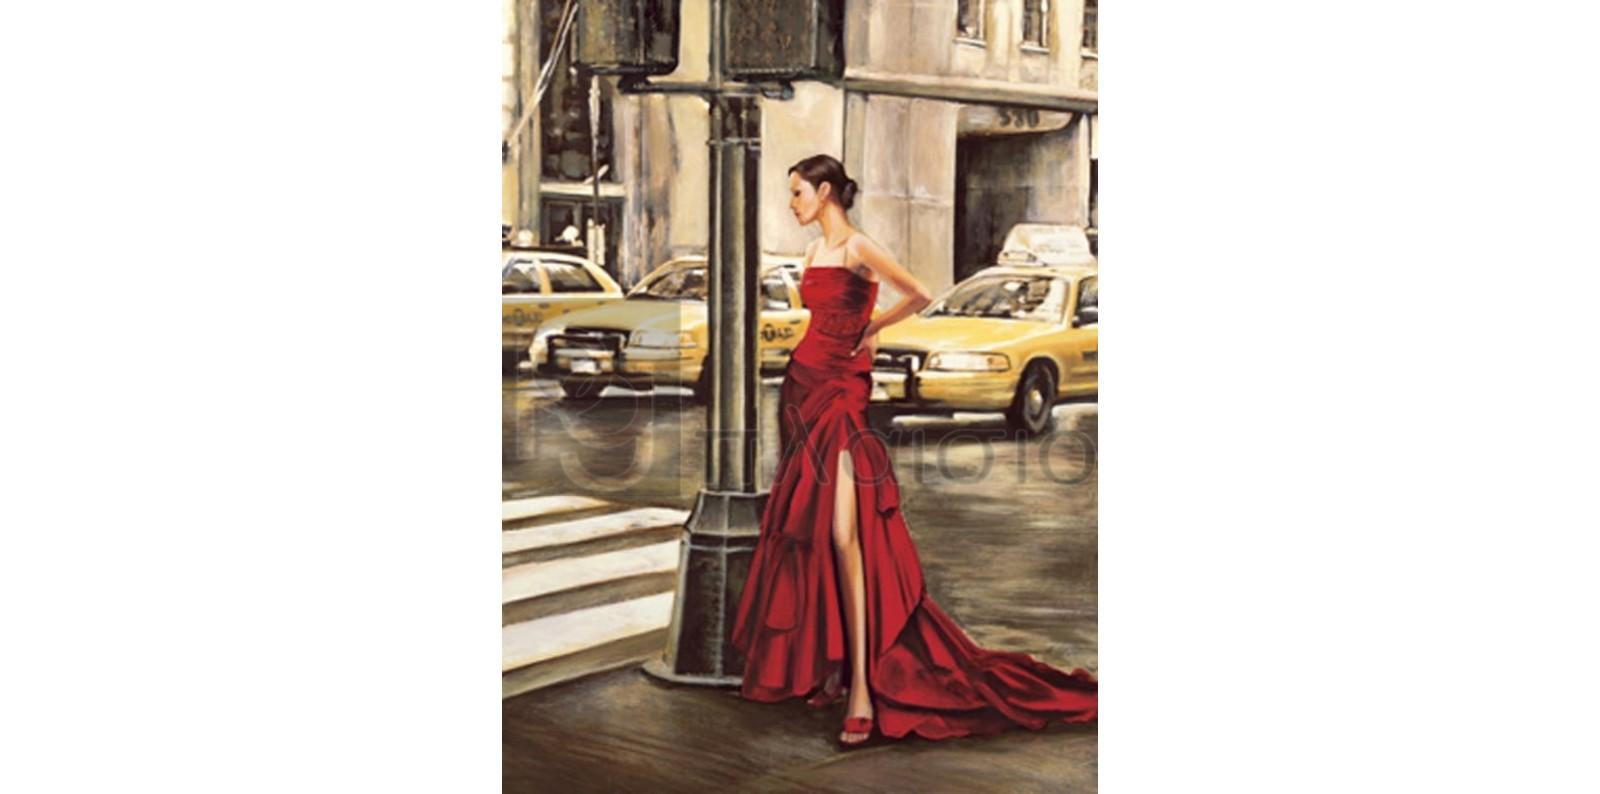 Edoardo Rovere - Woman in New York